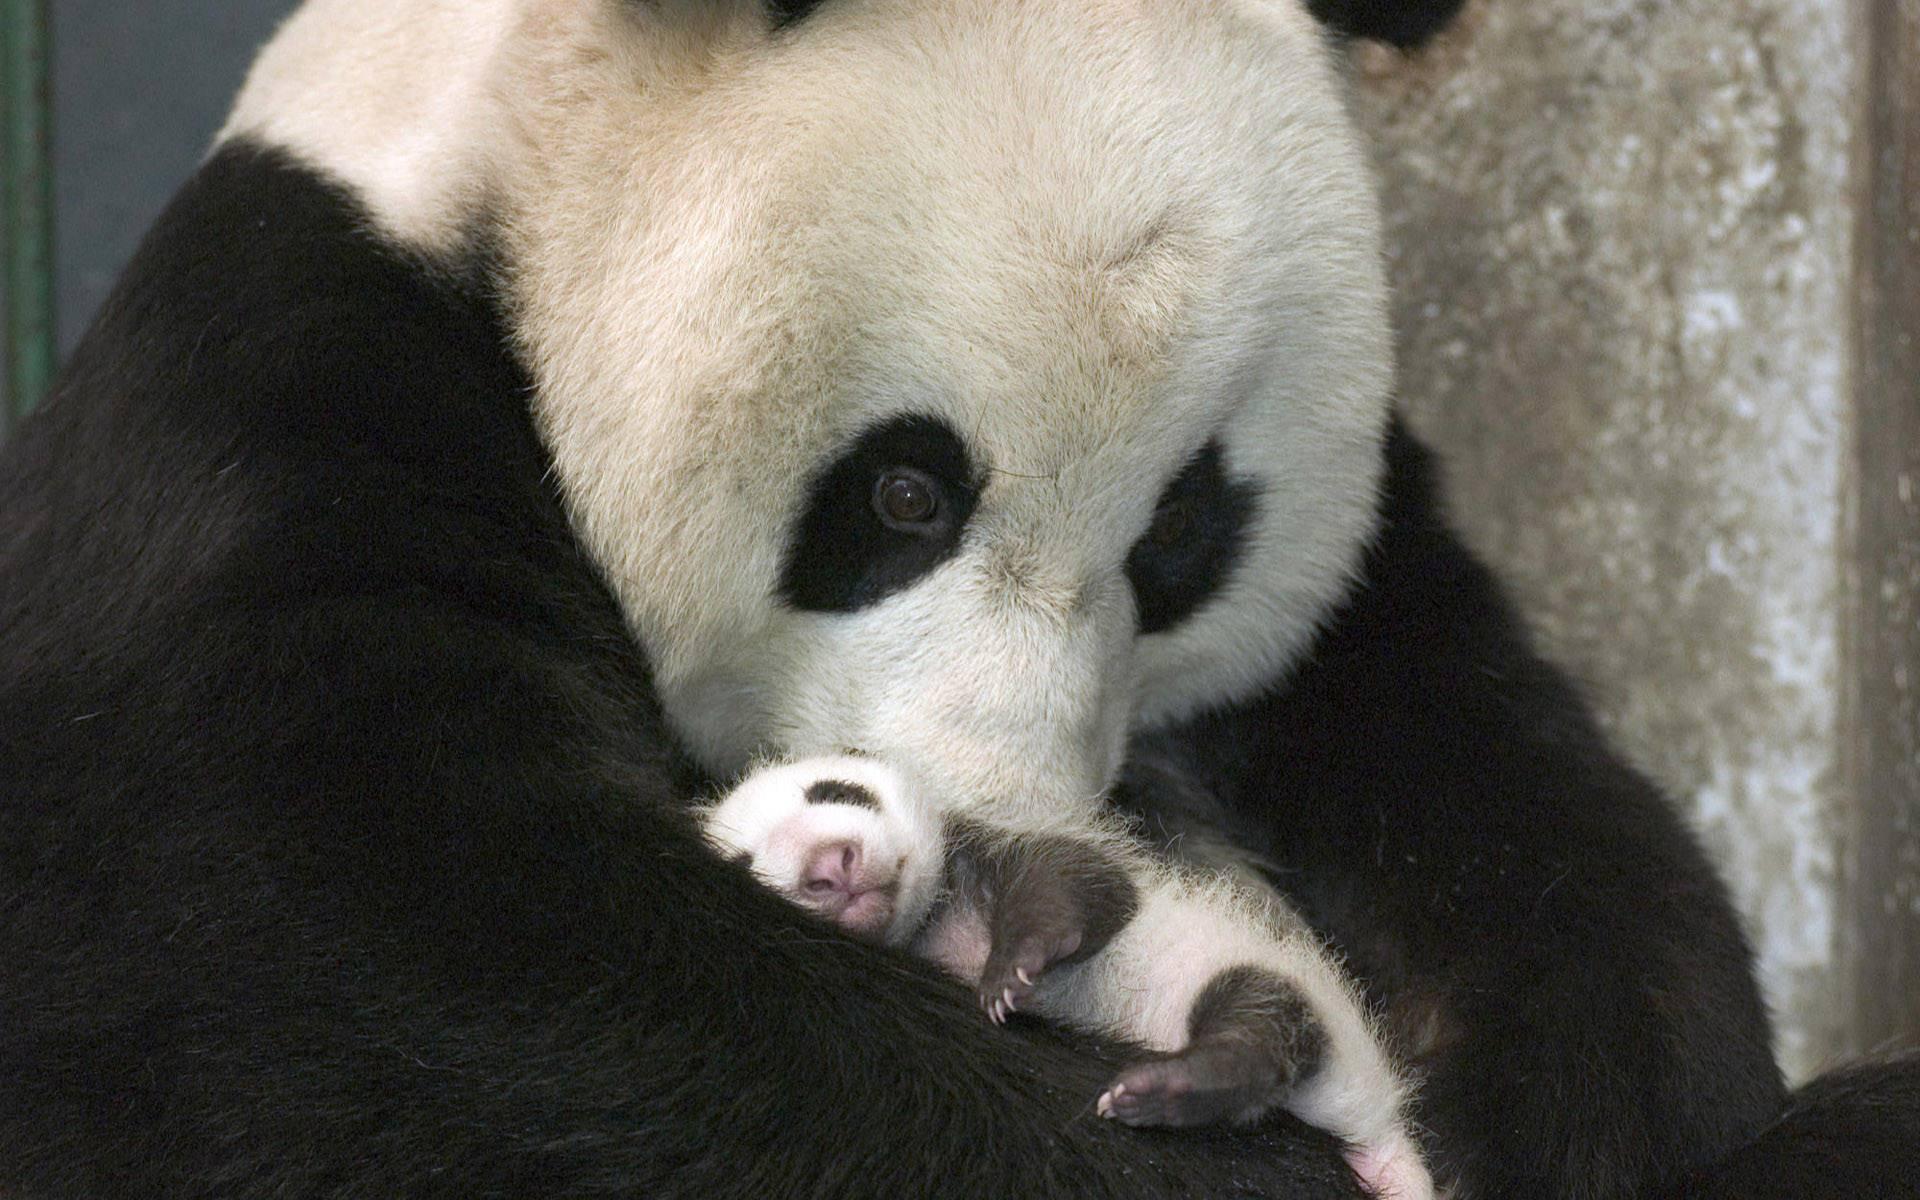 Panda Baby Animals Wallpapers 1920x1200